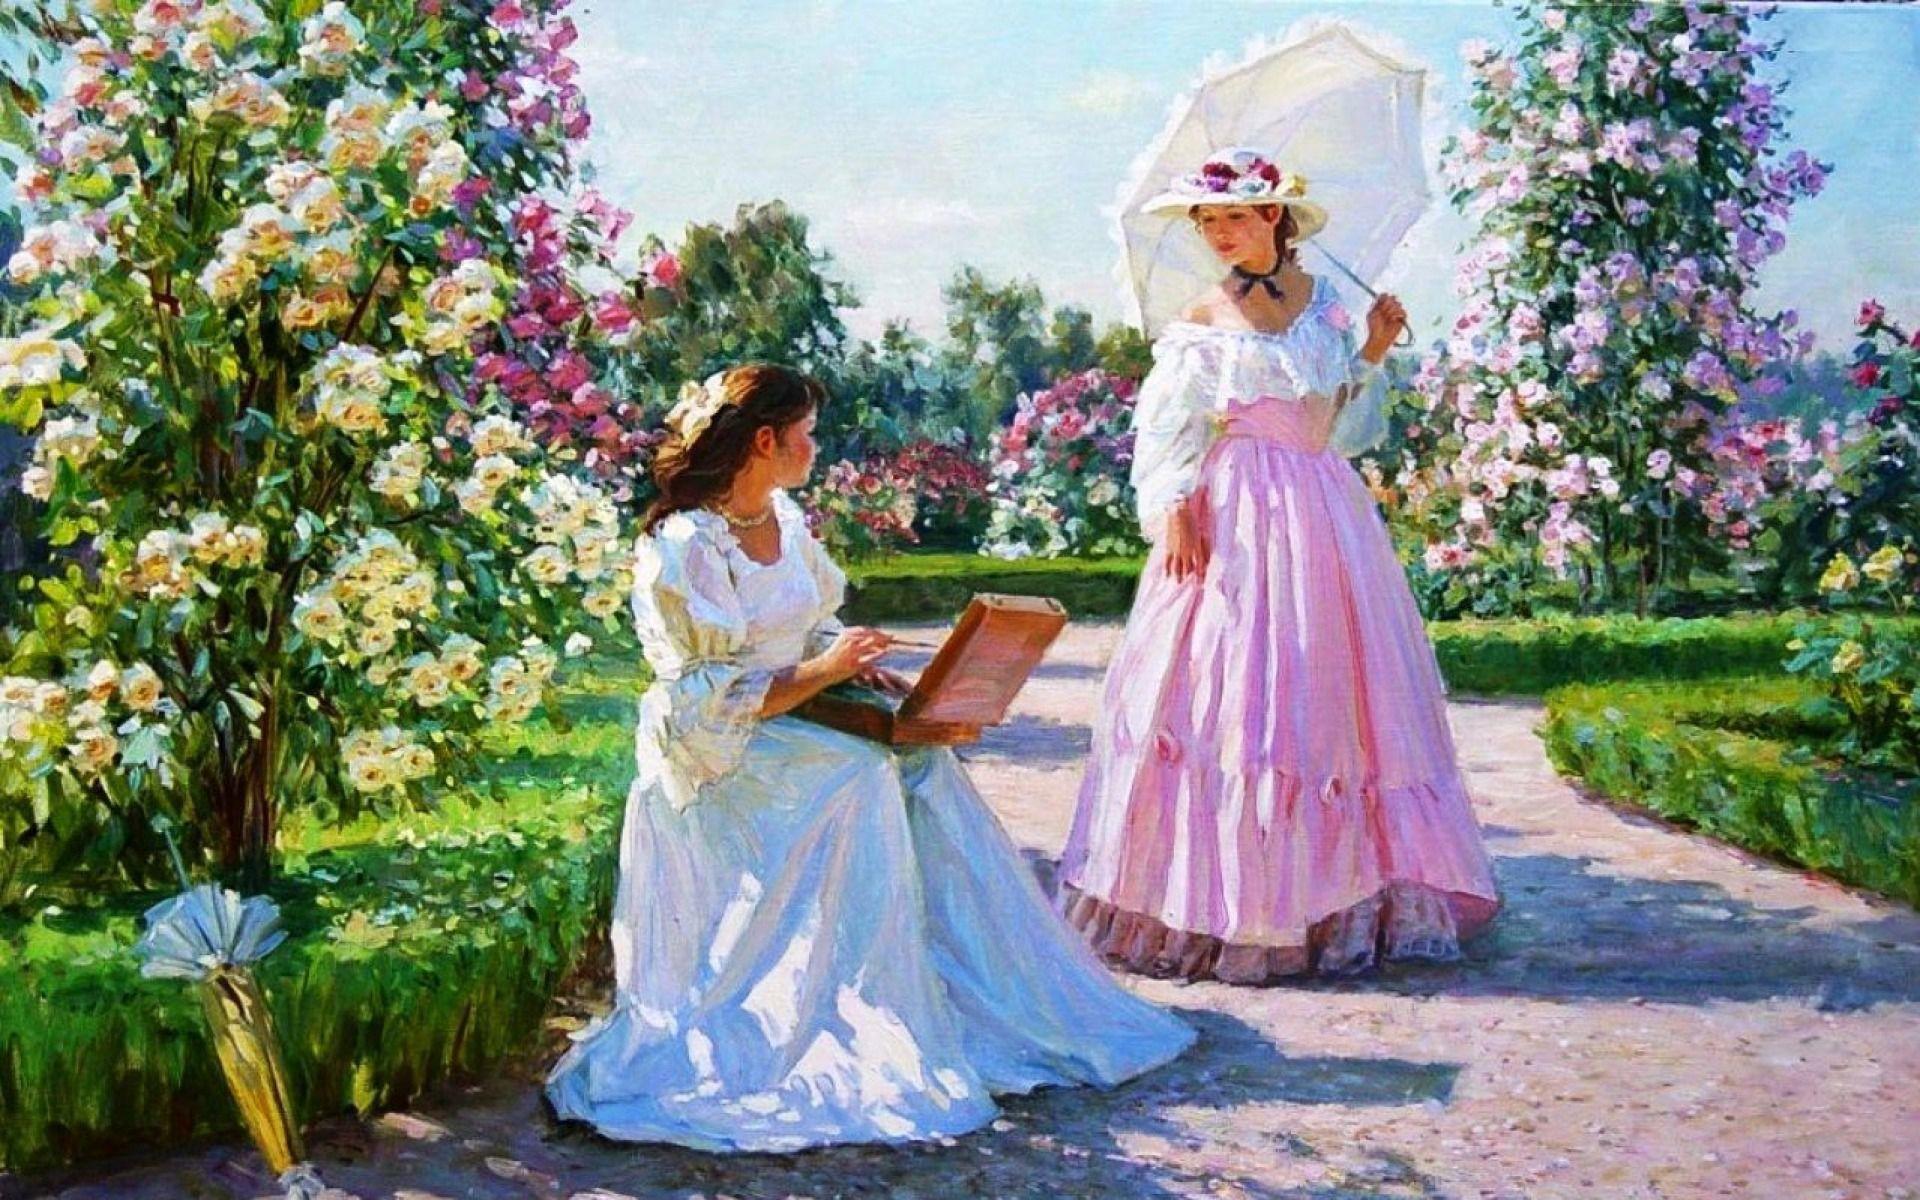 Res: 1920x1200, Fascinating Women U Rose Garden Pict Of Beautiful Wallpaper Trends And  Styles Beautiful Garden Wallpaper